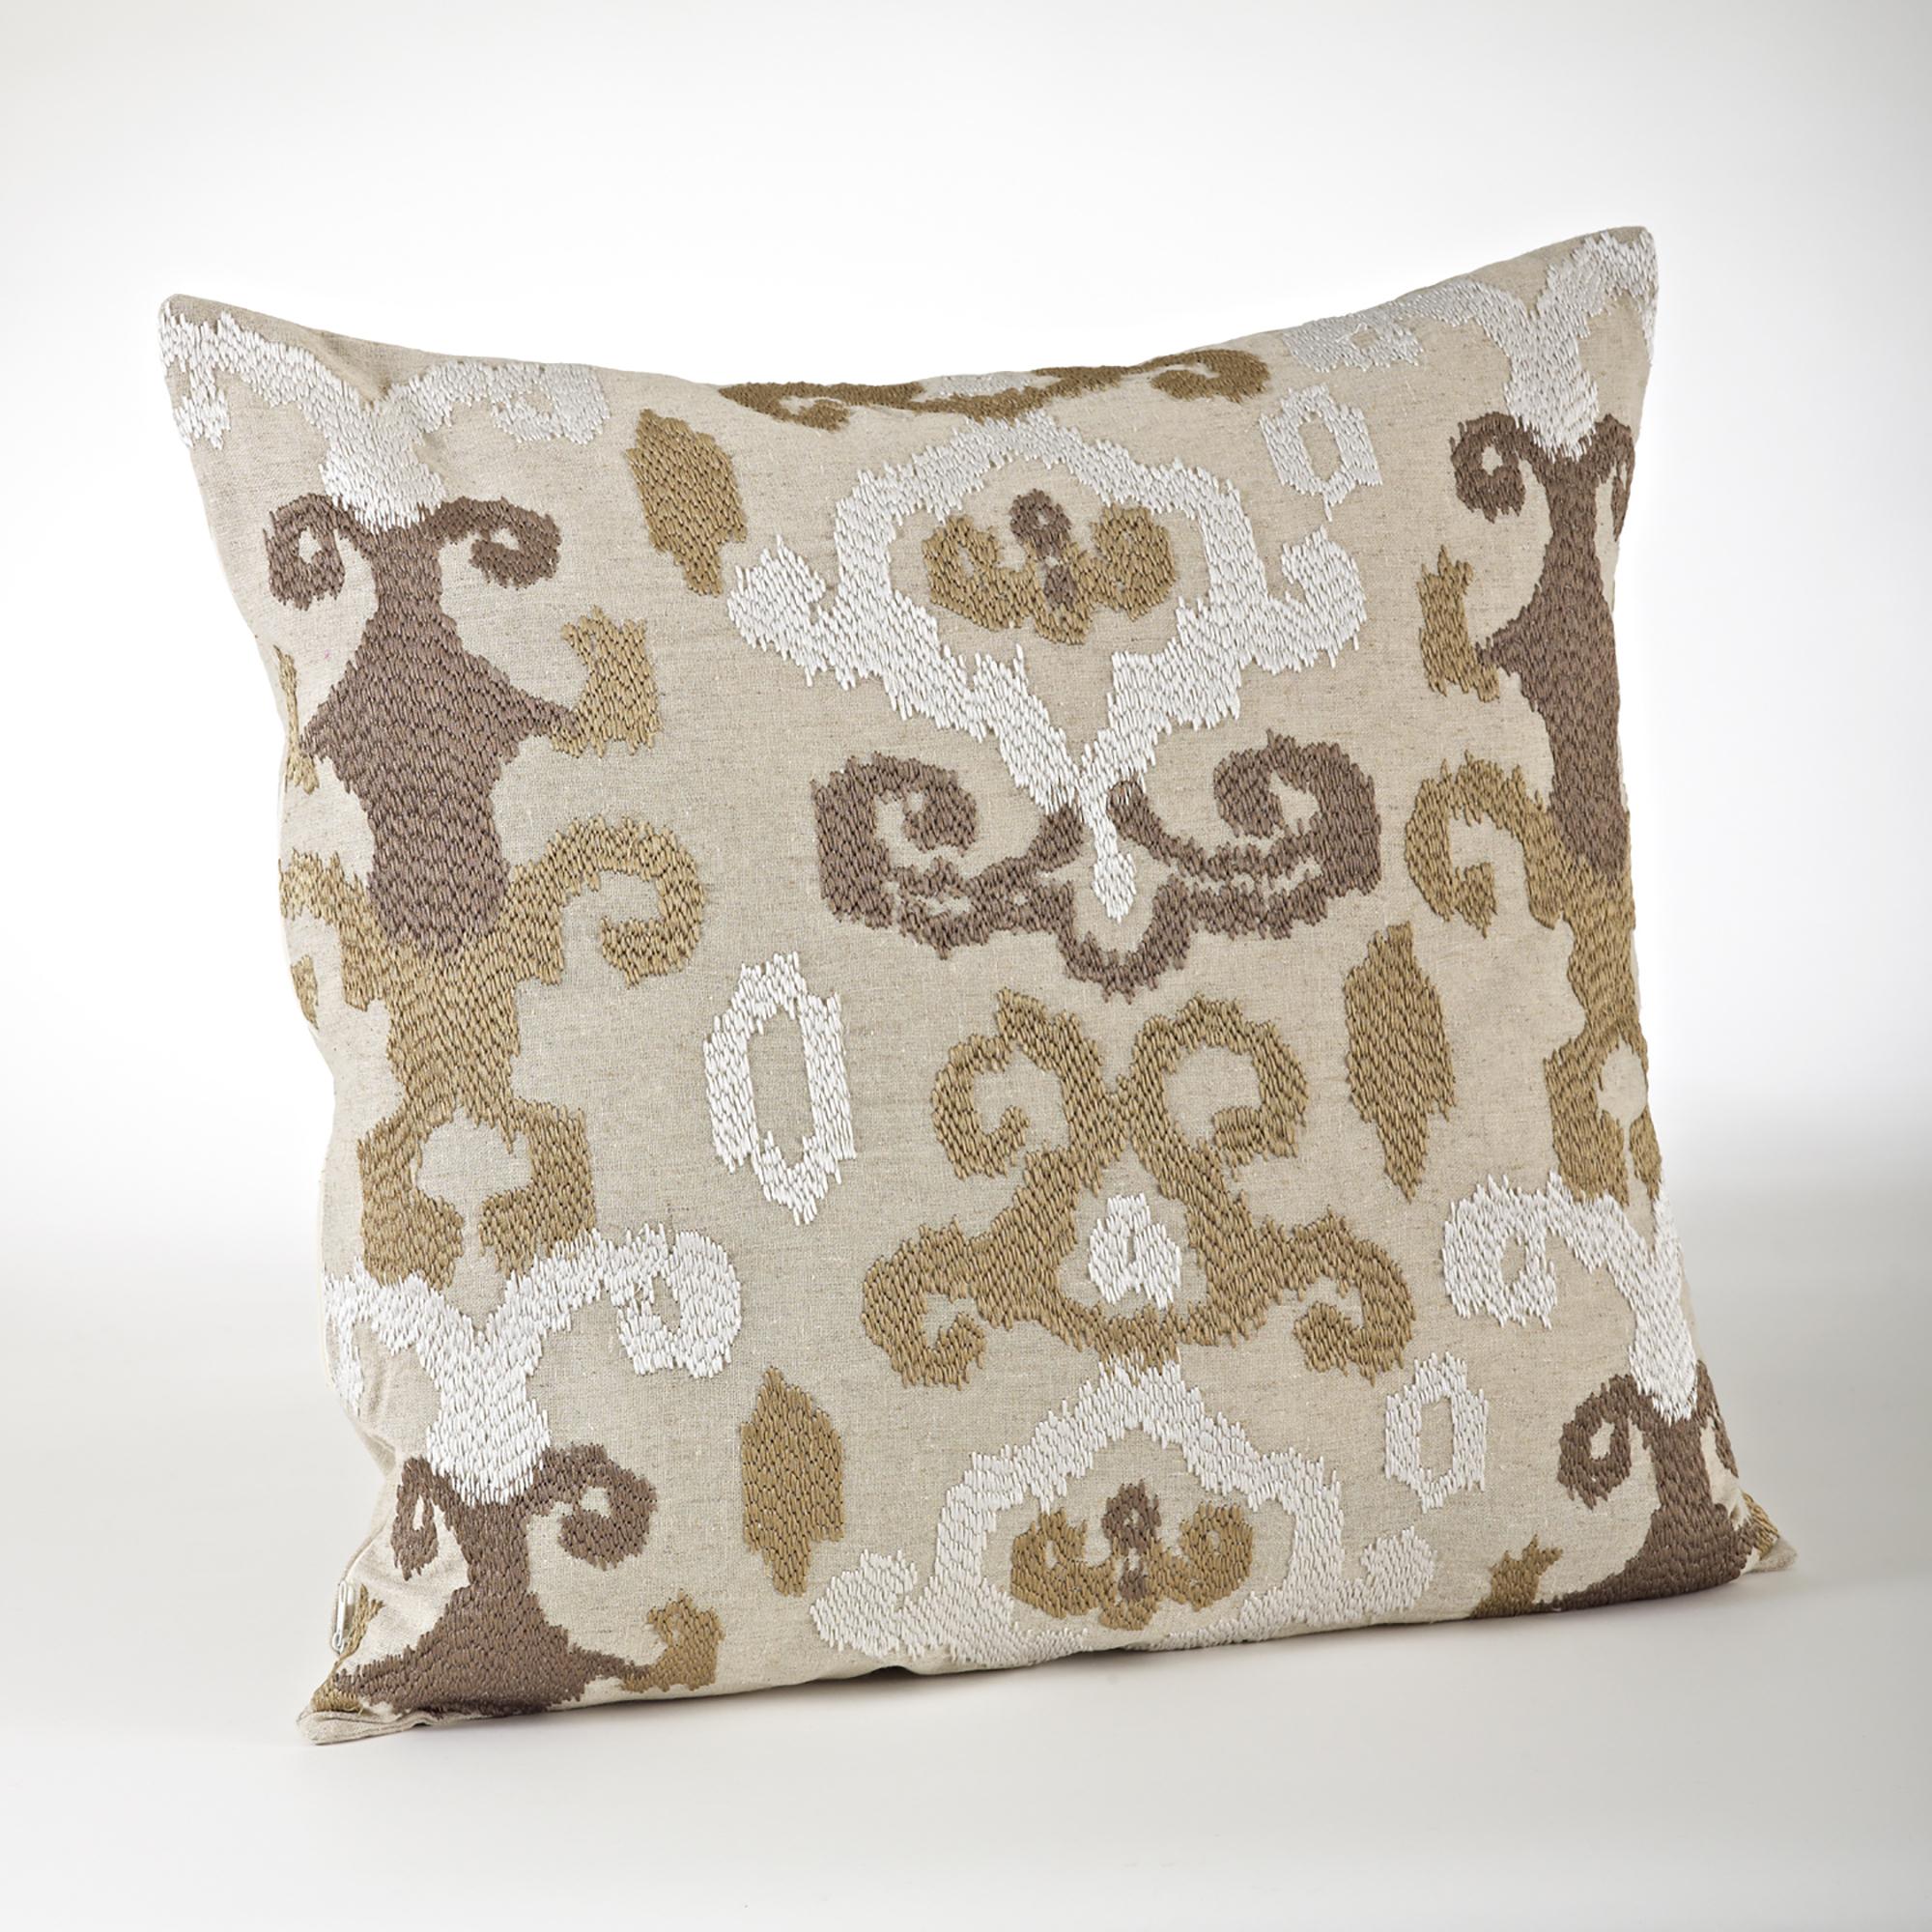 20-inch Embroidered Ikat Design Throw Pillow - Saro Lifestyle 0127.CS20S